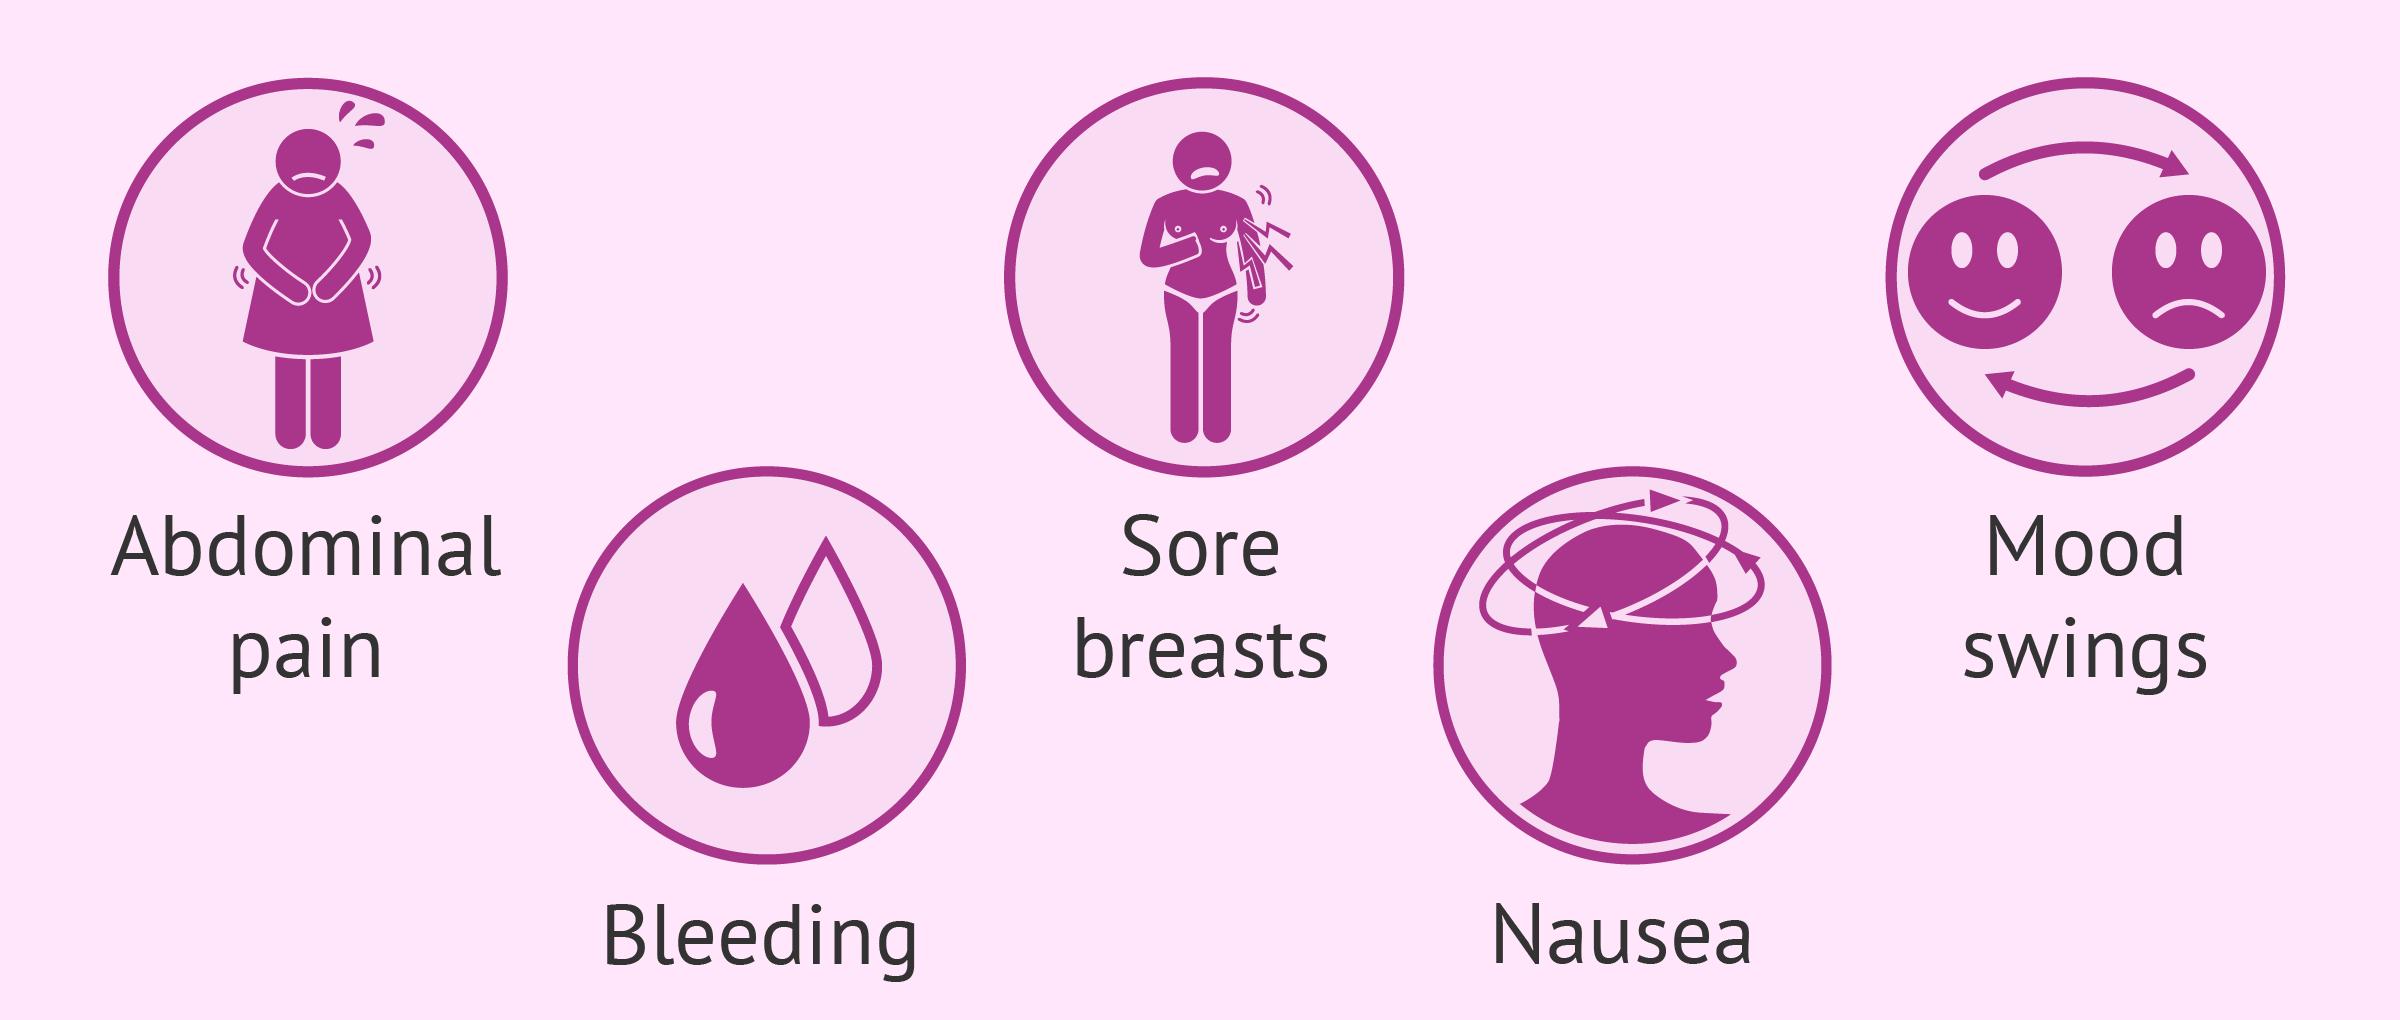 First week pregnancy symptoms